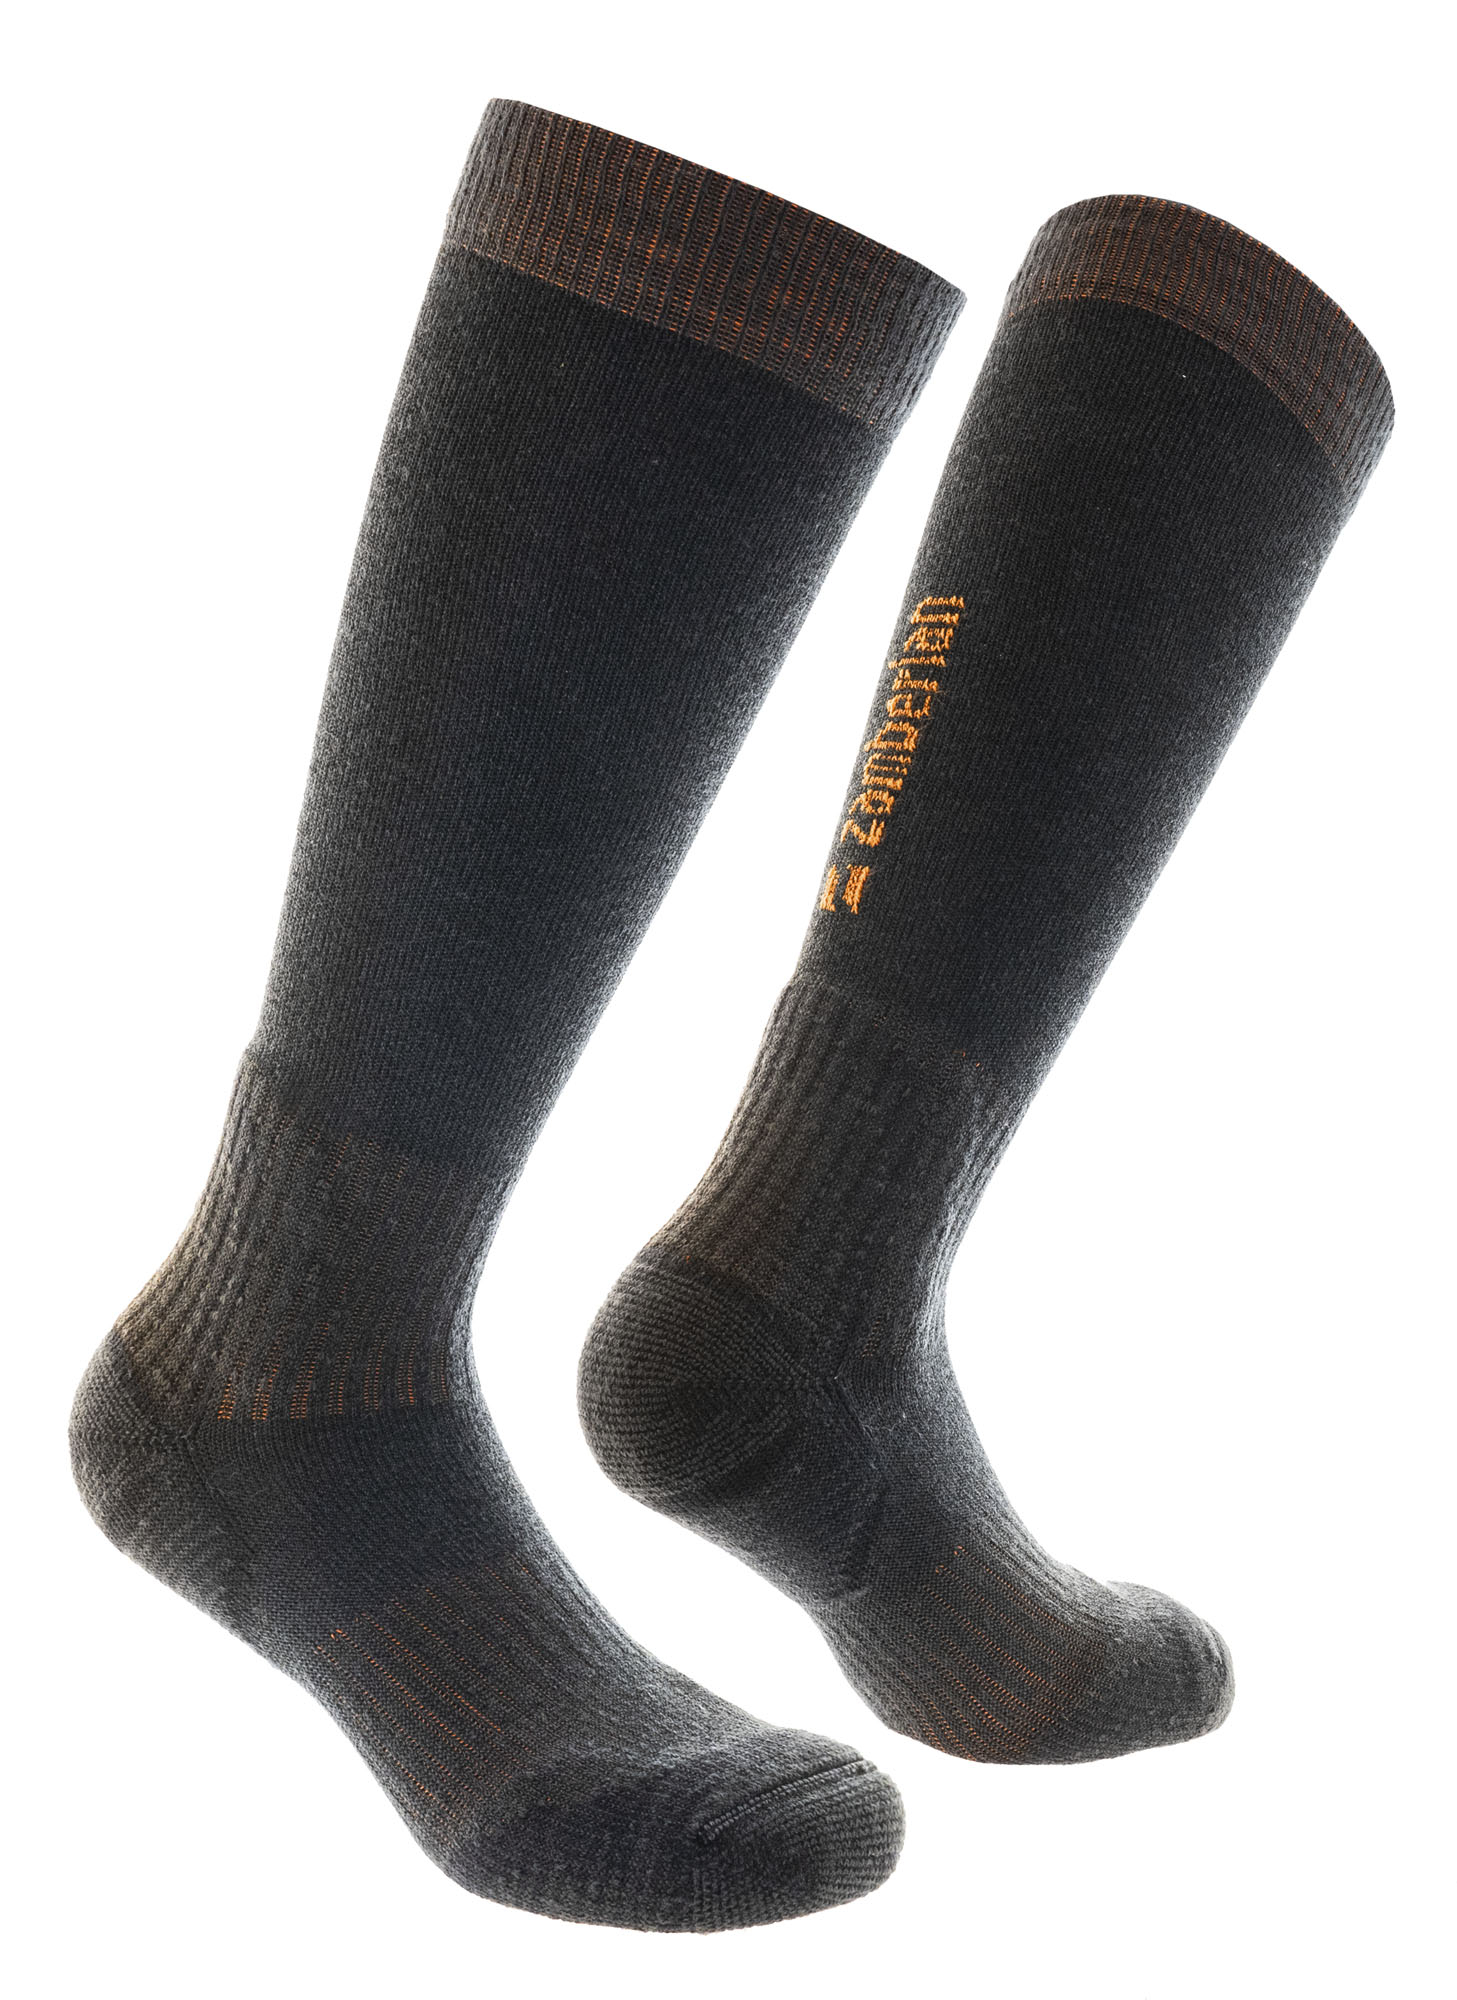 HIKING SOCKS ZAMBERLAN® ALPINE PEAK - Black